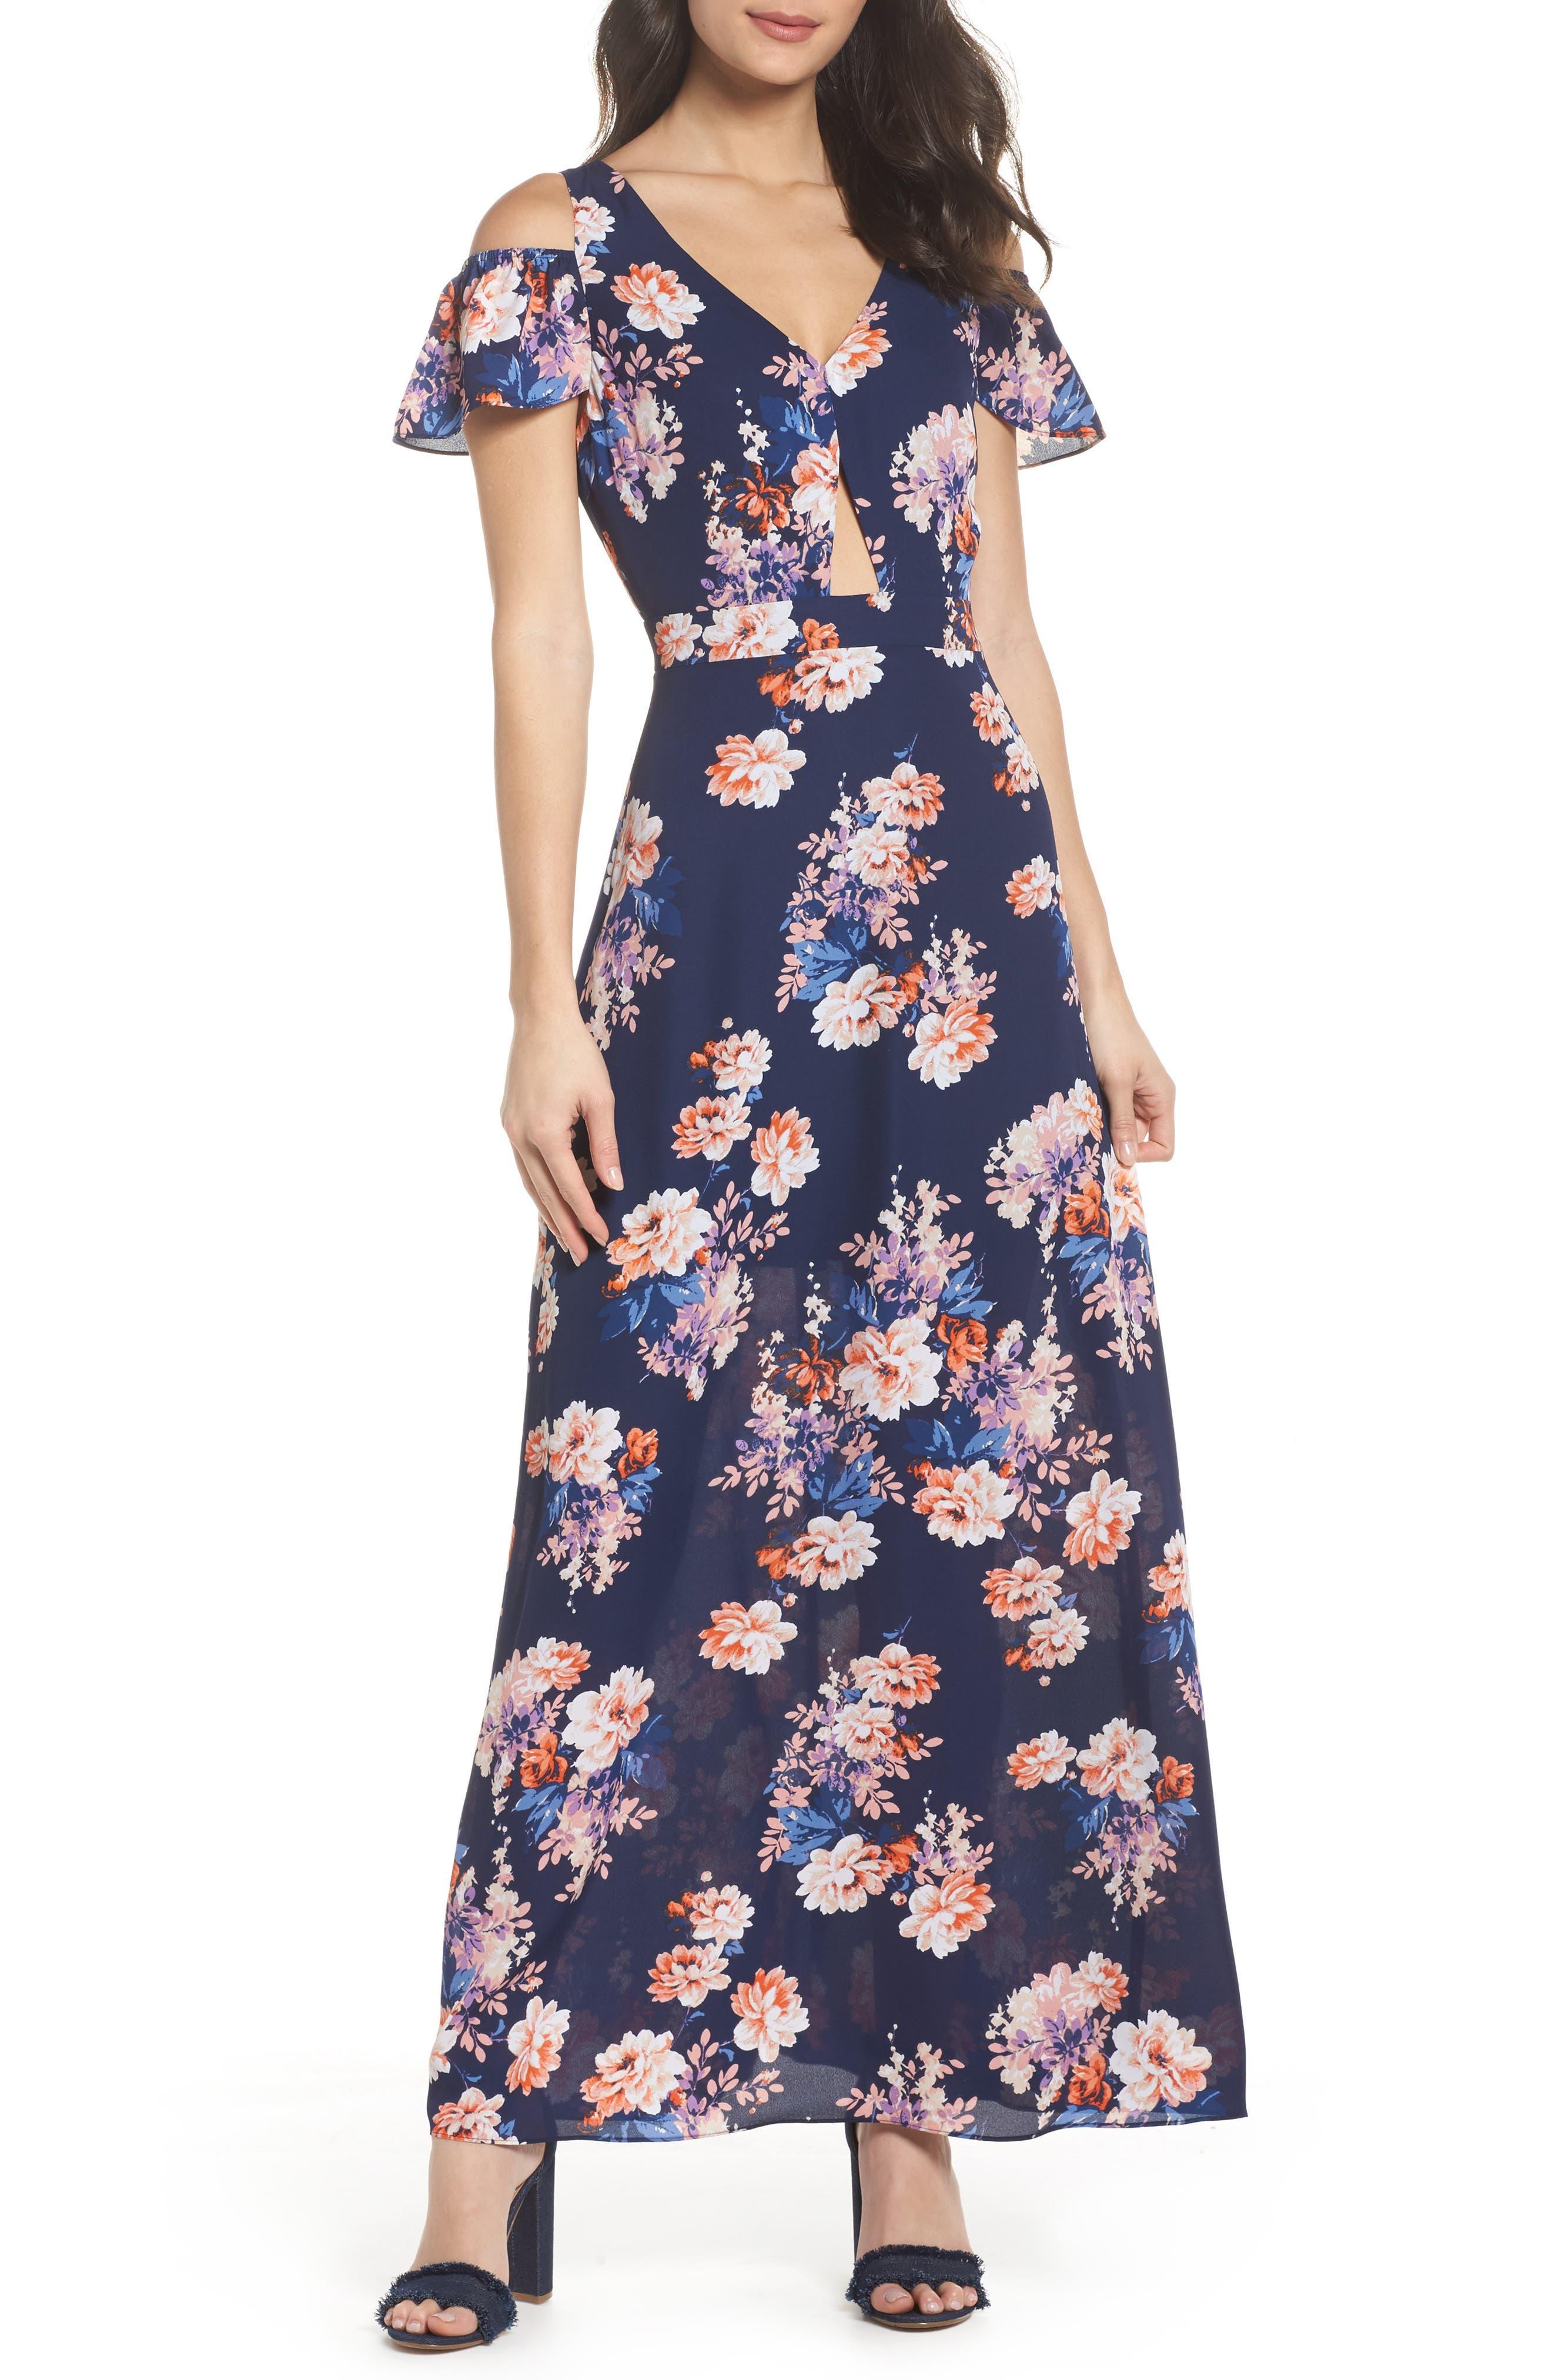 Chasing Butterflies Maxi Dress,                             Main thumbnail 1, color,                             400